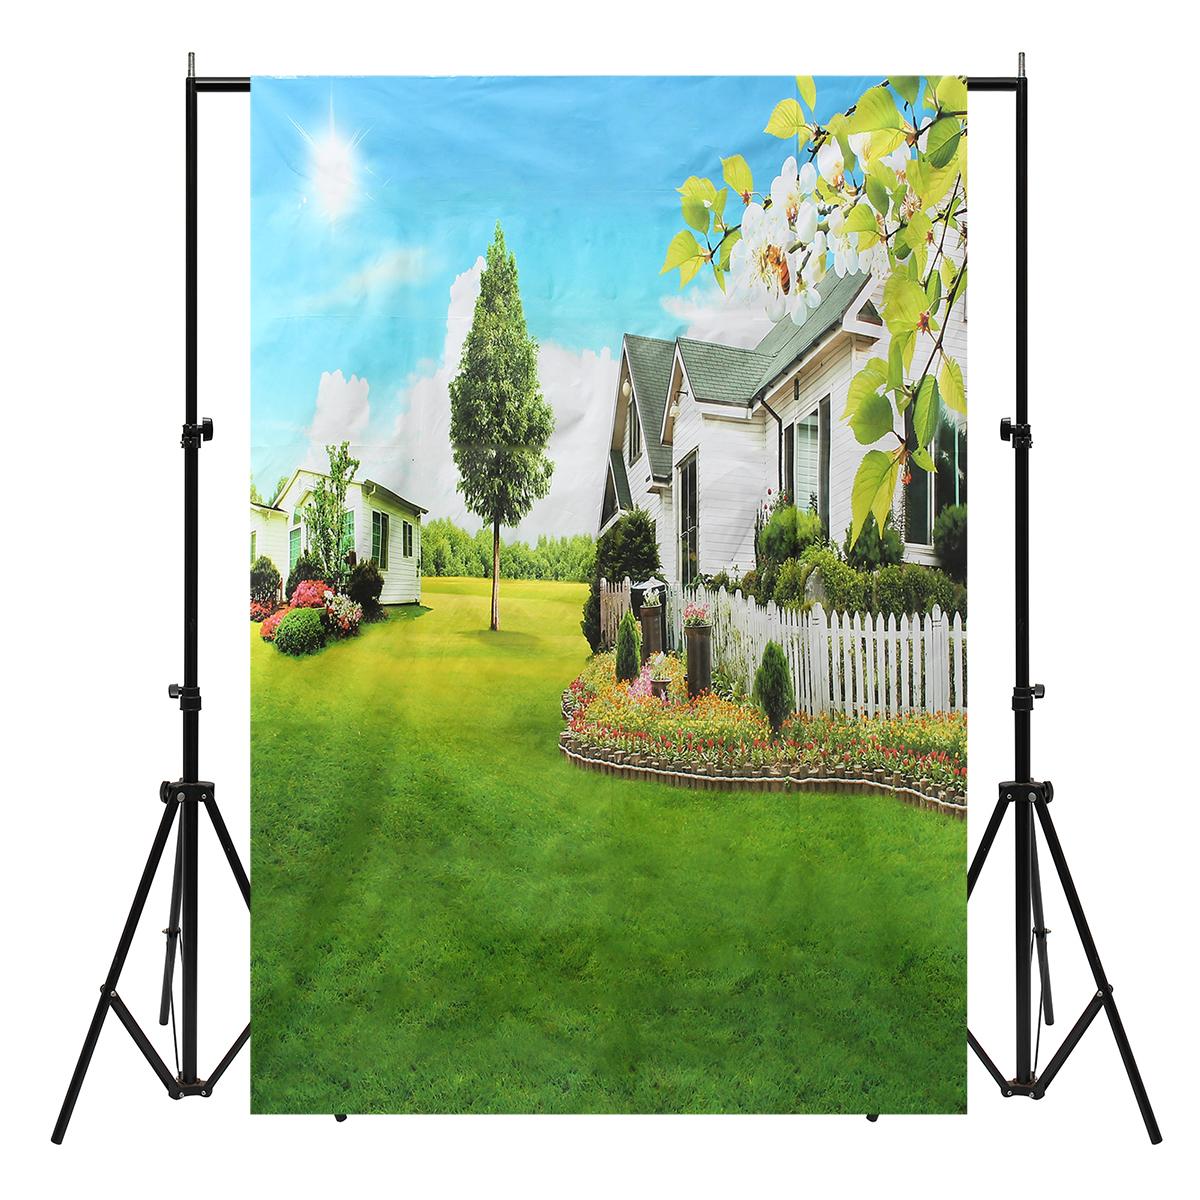 5x7FT Vinyl Outdoor Lawn Photography Background Backdrop Studio Prop